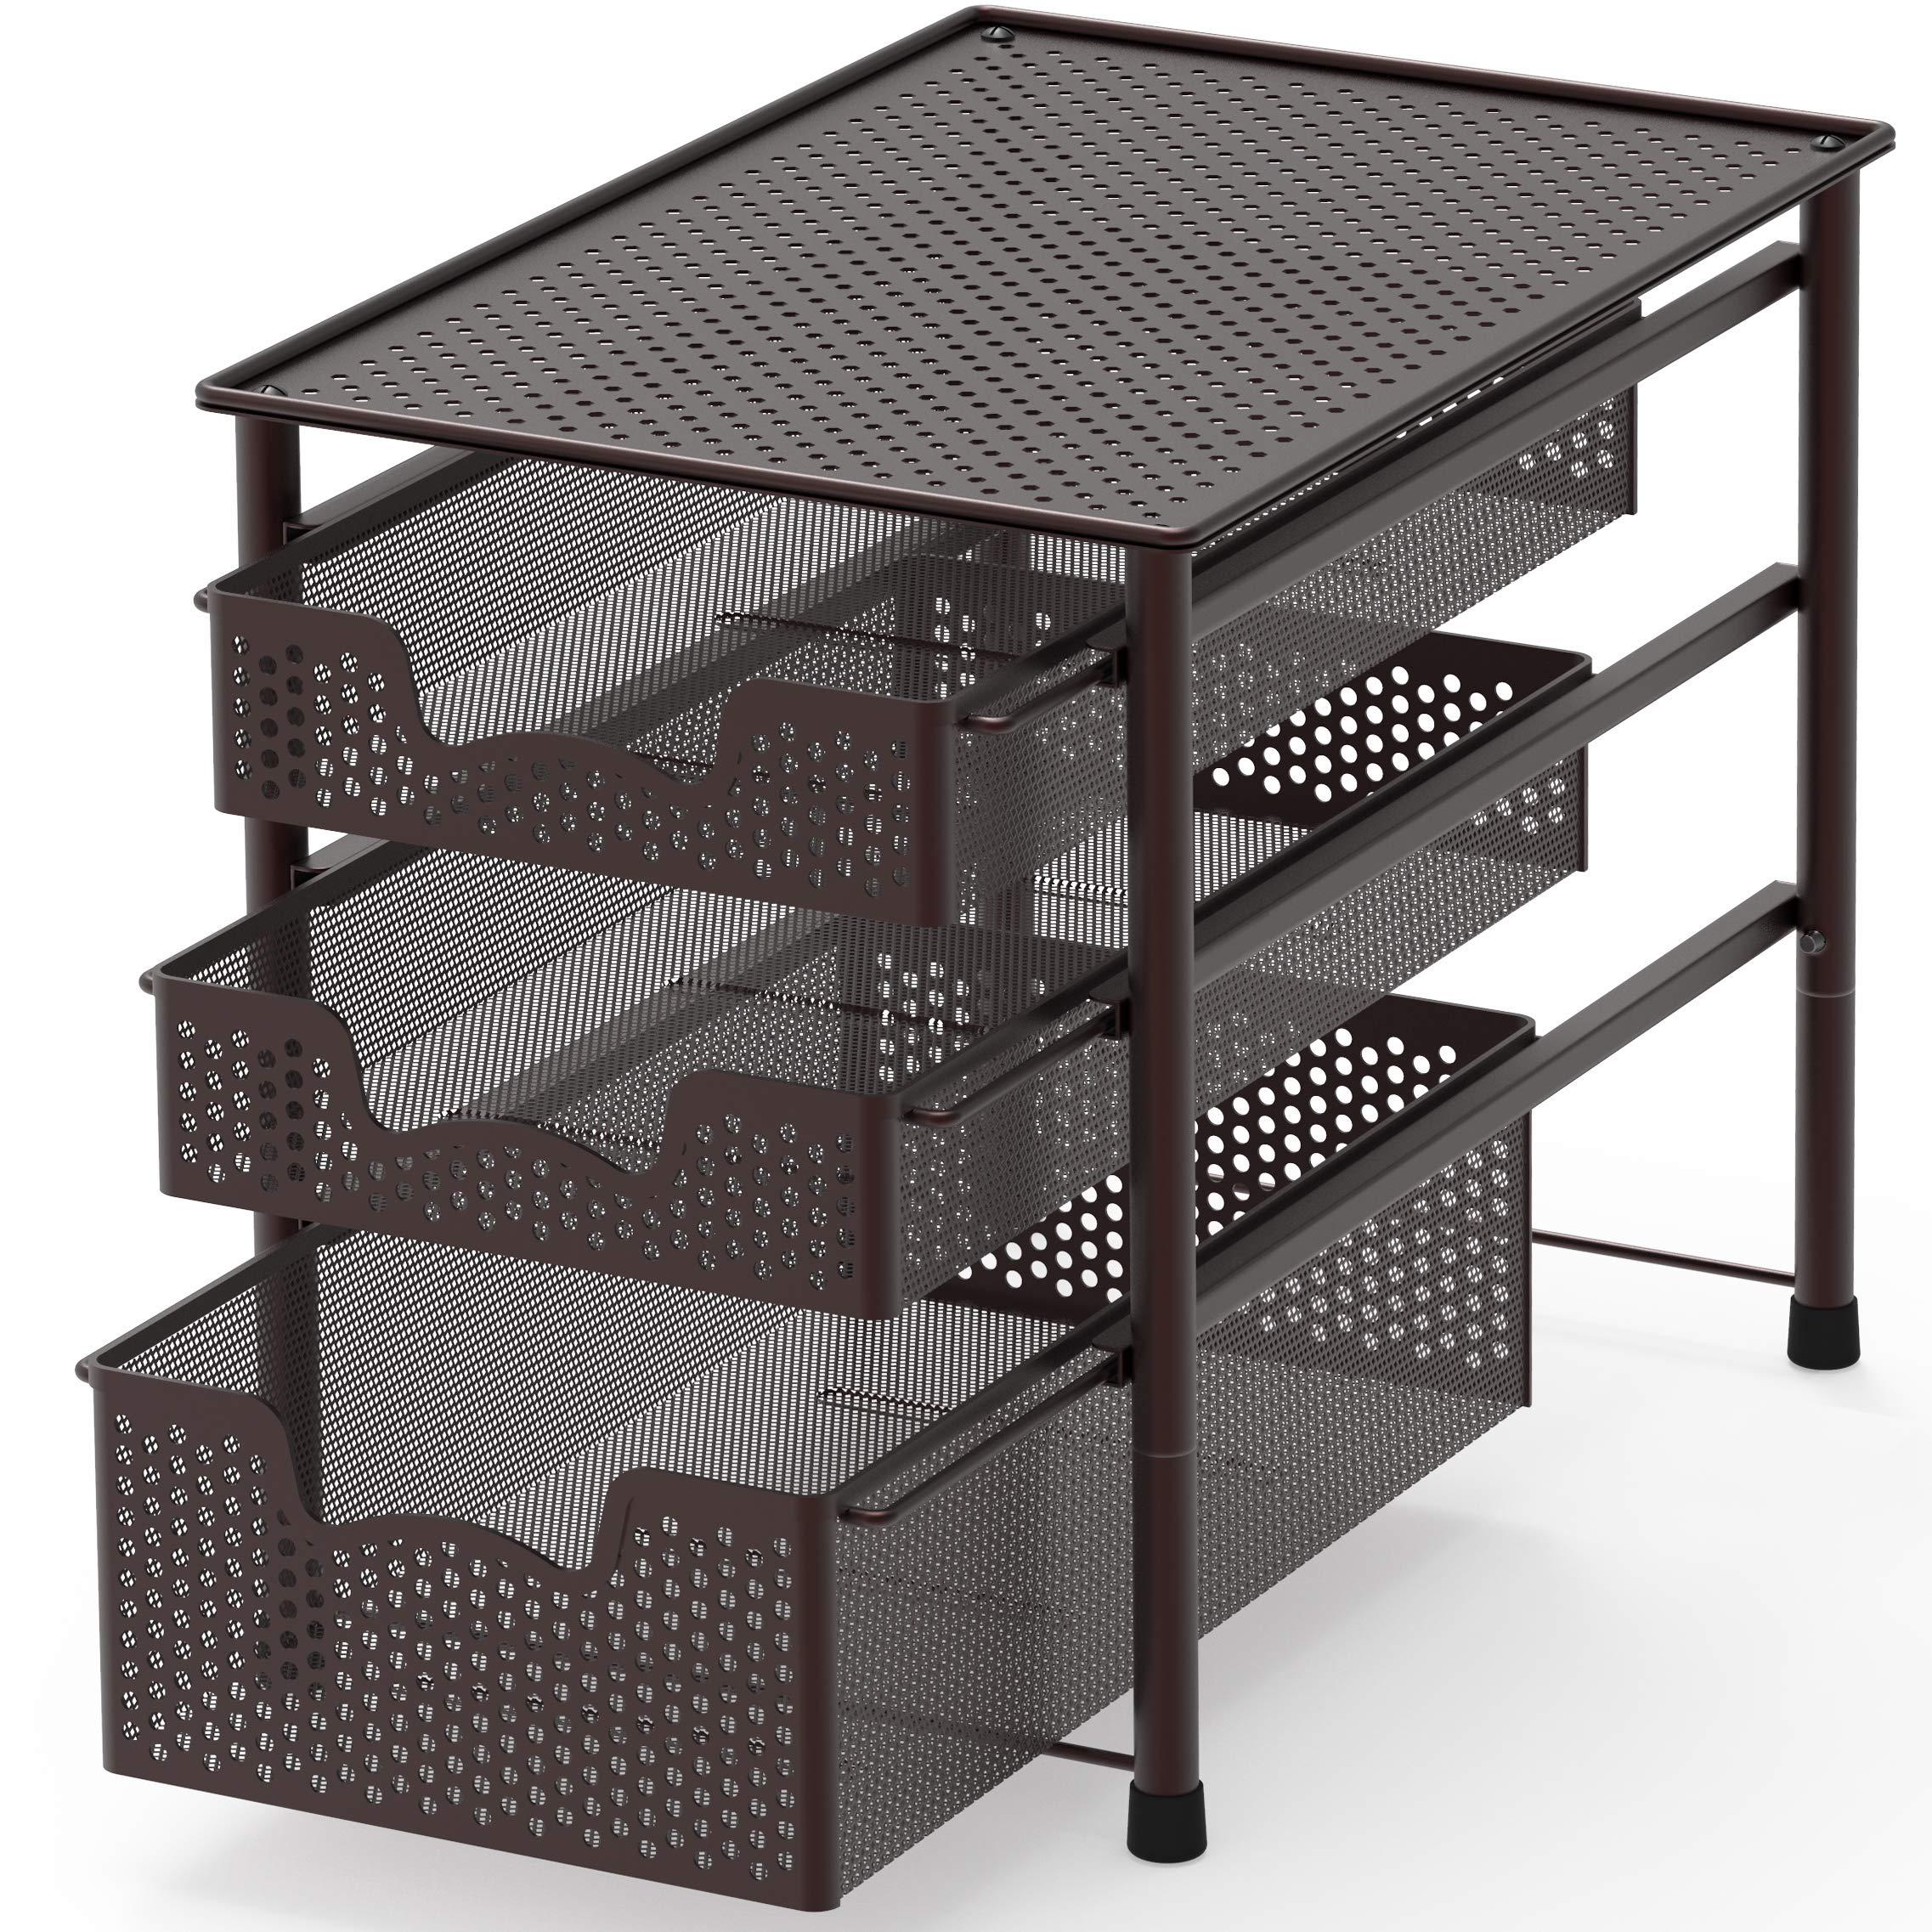 Simple Houseware Stackable 3 Tier Sliding Basket Organizer Drawer, Bronze by Simple Houseware